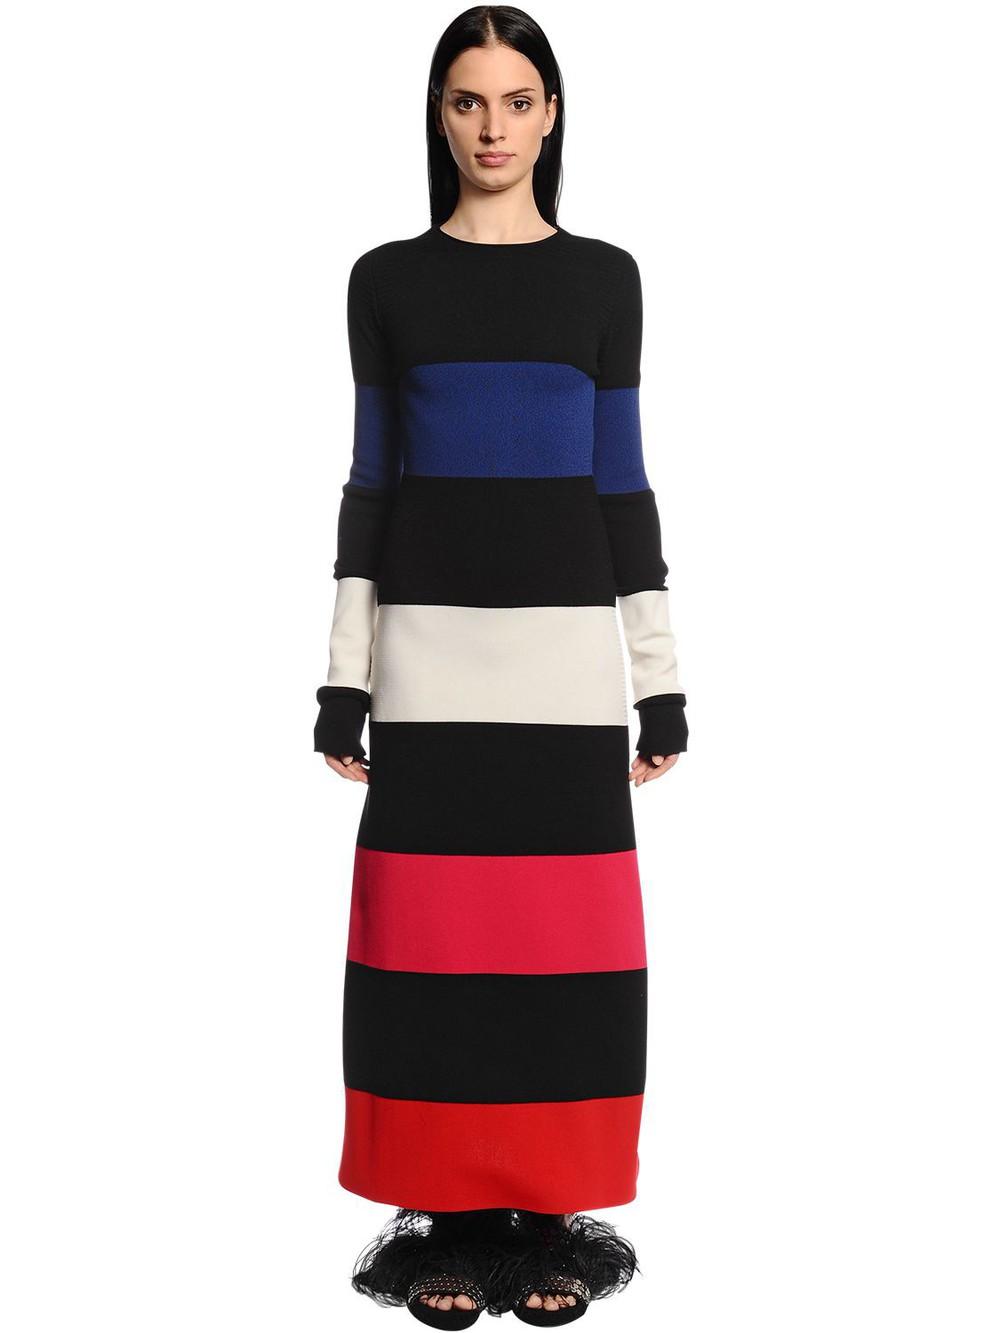 SONIA RYKIEL Striped Stretch Wool Blend Knit Dress